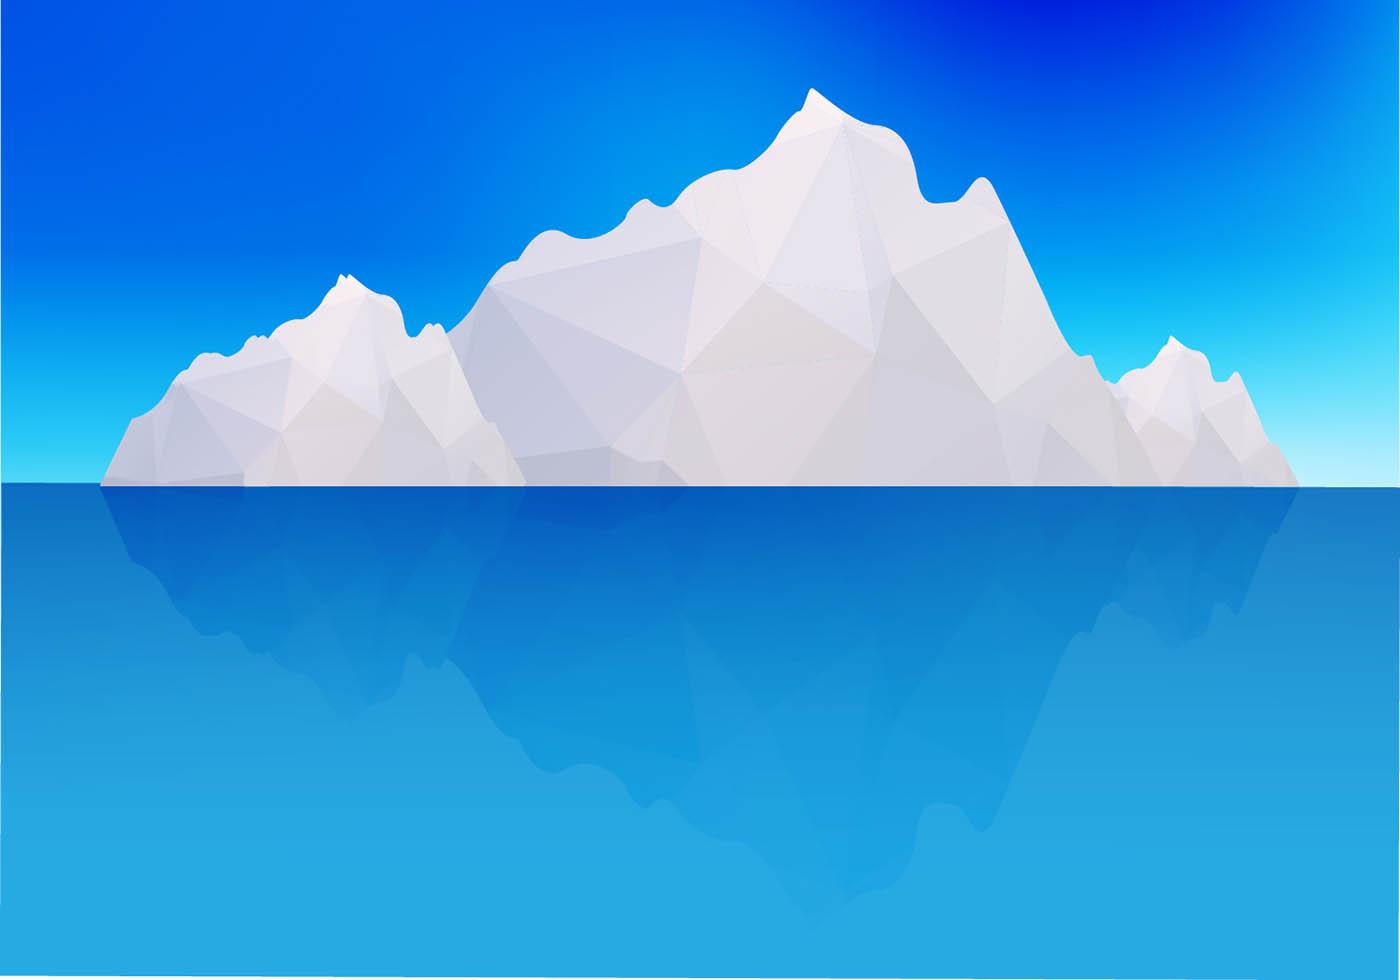 Cute Penguin Wallpaper Cartoon Iceberg Vector Download Free Vector Art Stock Graphics